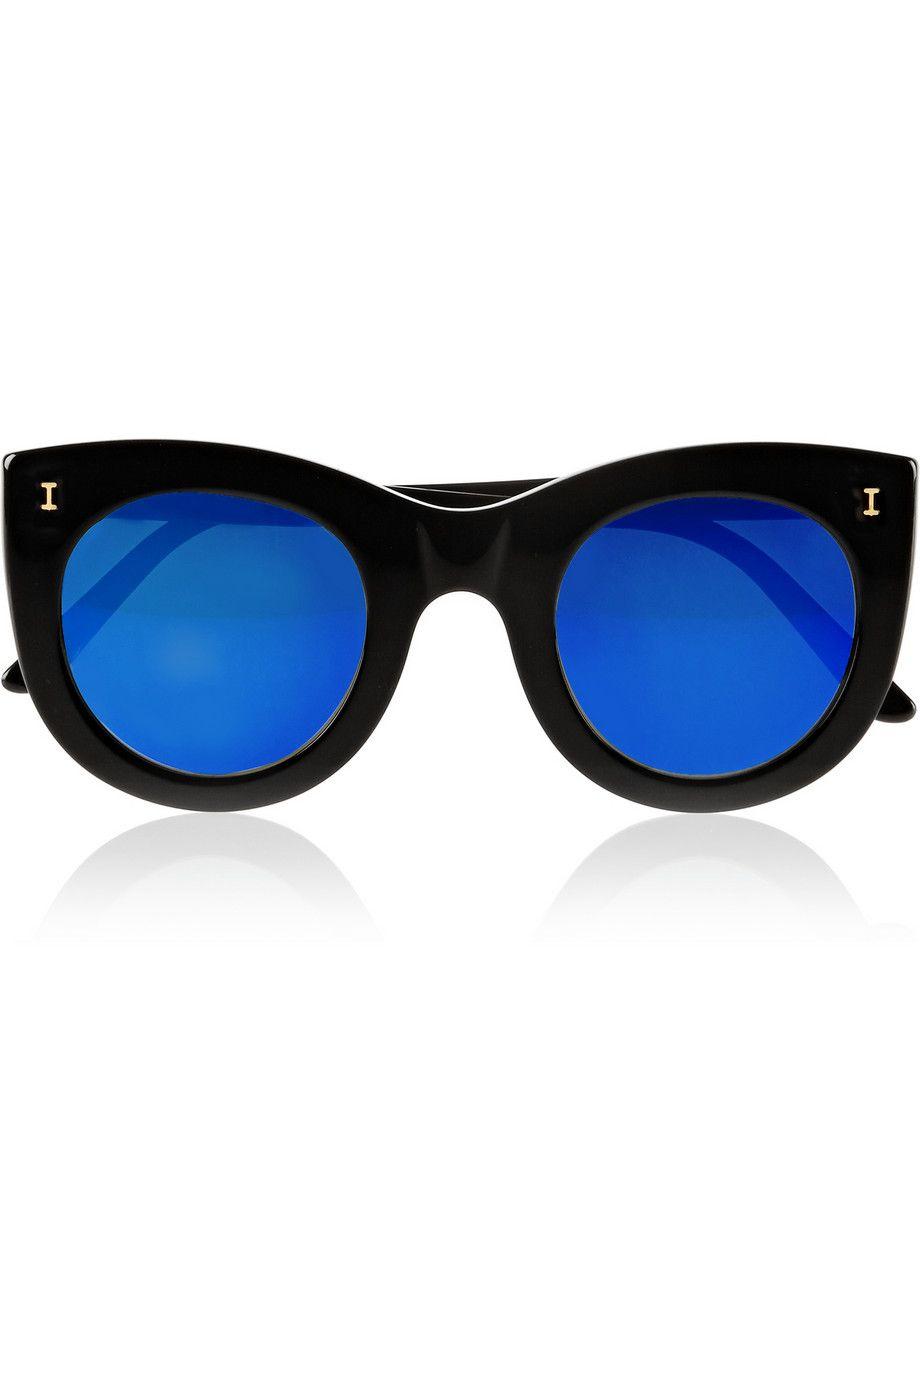 Illesteva - Boca cat-eye acetate mirrored sunglasses